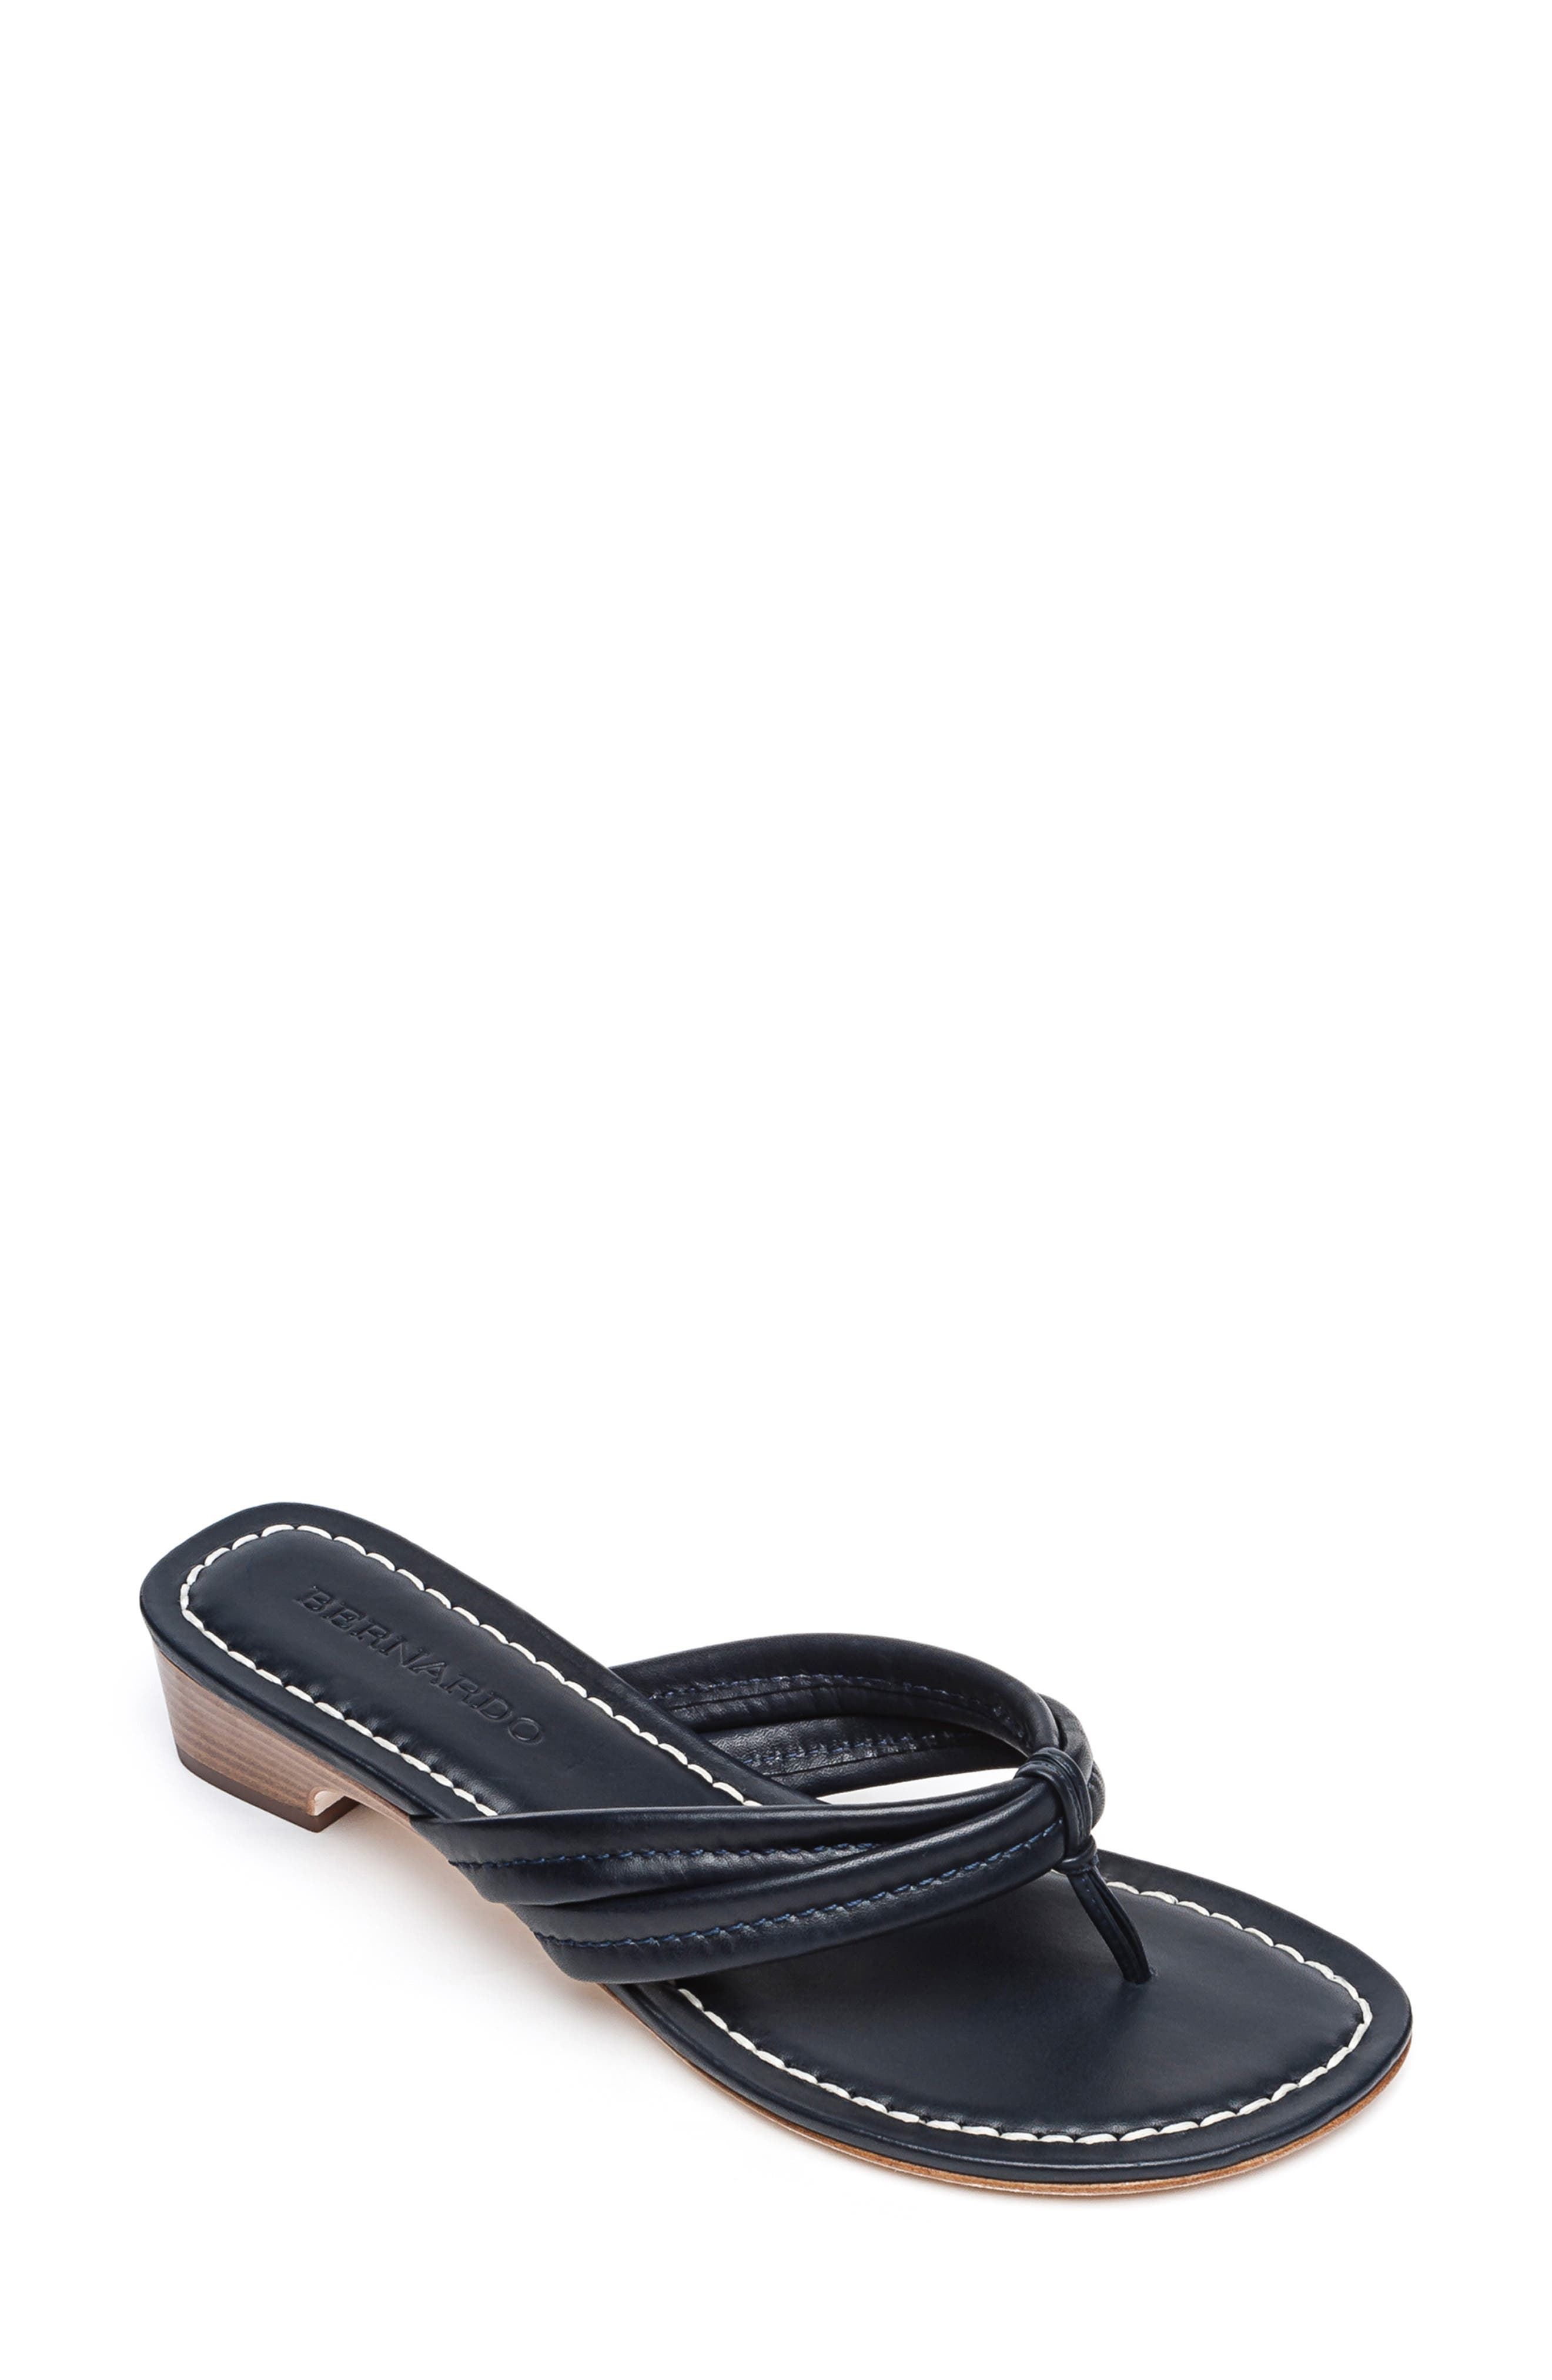 f0a2ae6f574 Bernardo Flip-Flops   Sandals for Women